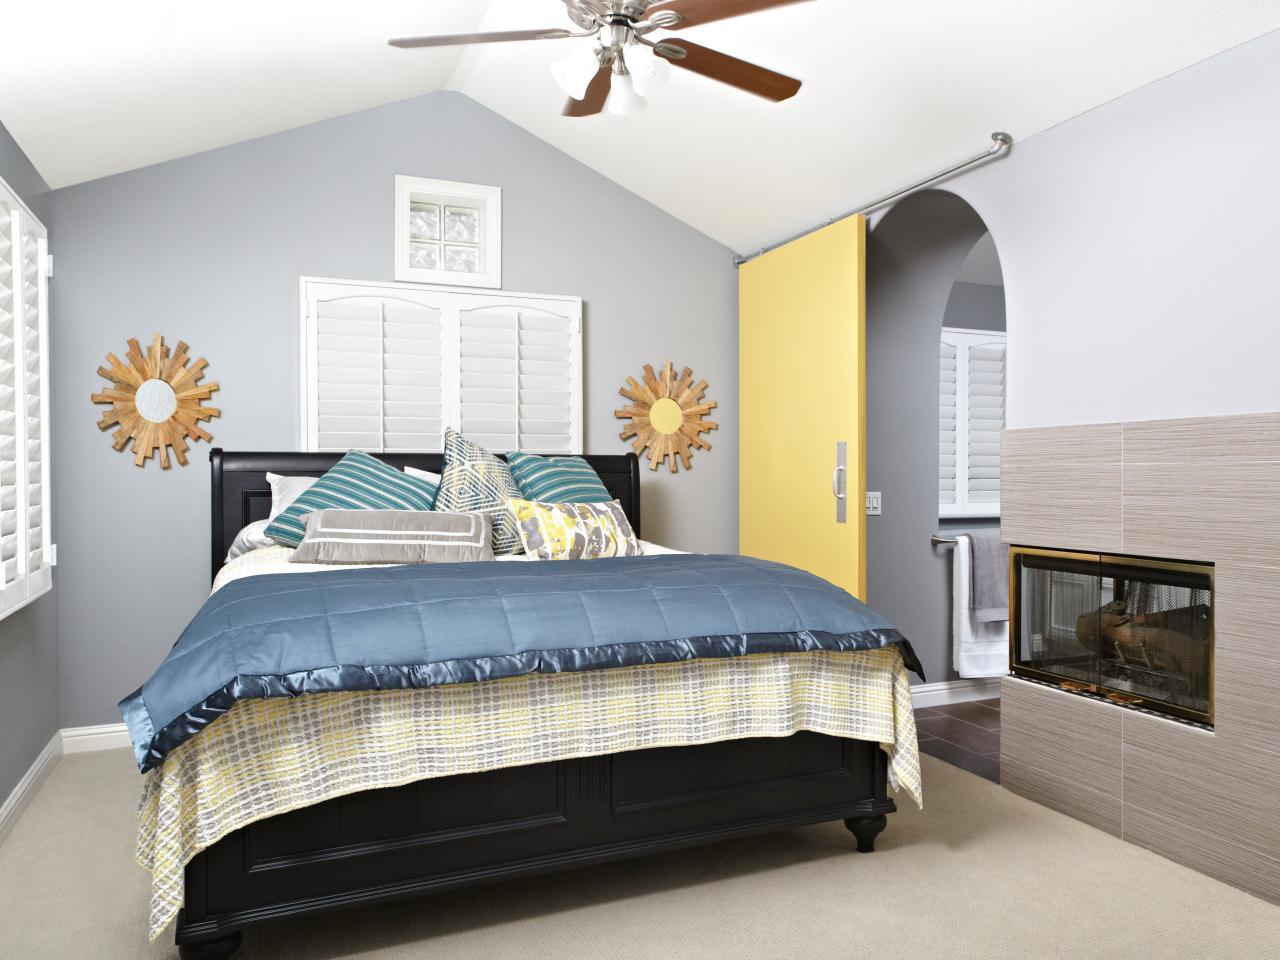 Diy sliding interior barn doors - Laurie March Odoc Pipe For Sliding Yellow Door_s4x3